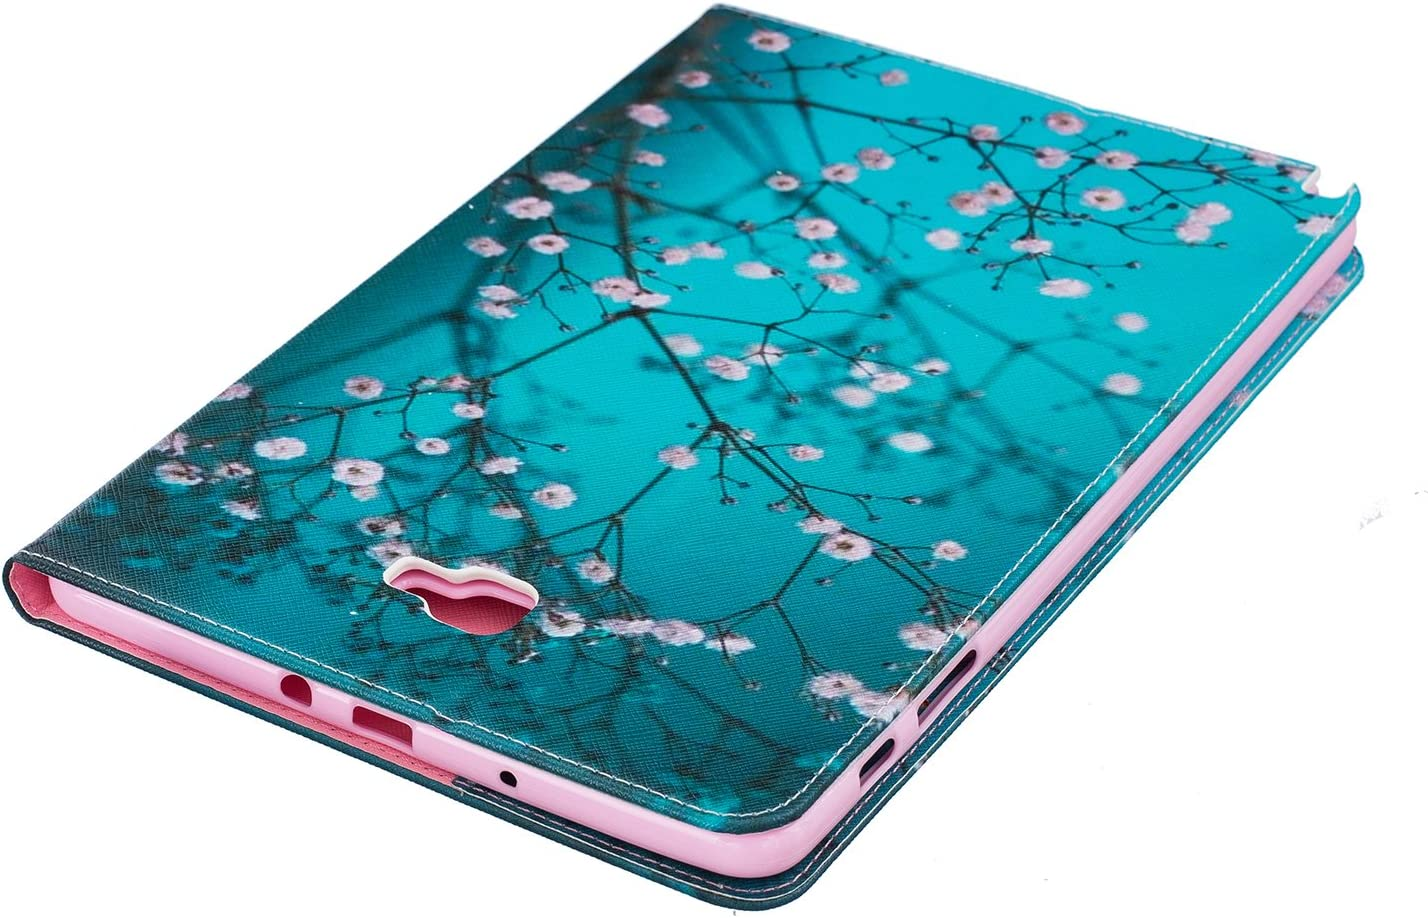 Samsung Galaxy Tab A 10.1/mit S Pen sm-p585//sm-p580 Fall beimu Ultra Leicht Slim PU Leder mit Kreditkarte /& ID Card Slot Schutzh/ülle f/ür Samsung Galaxy Tab A 10.1/mit S Pen P585//P580 B/är